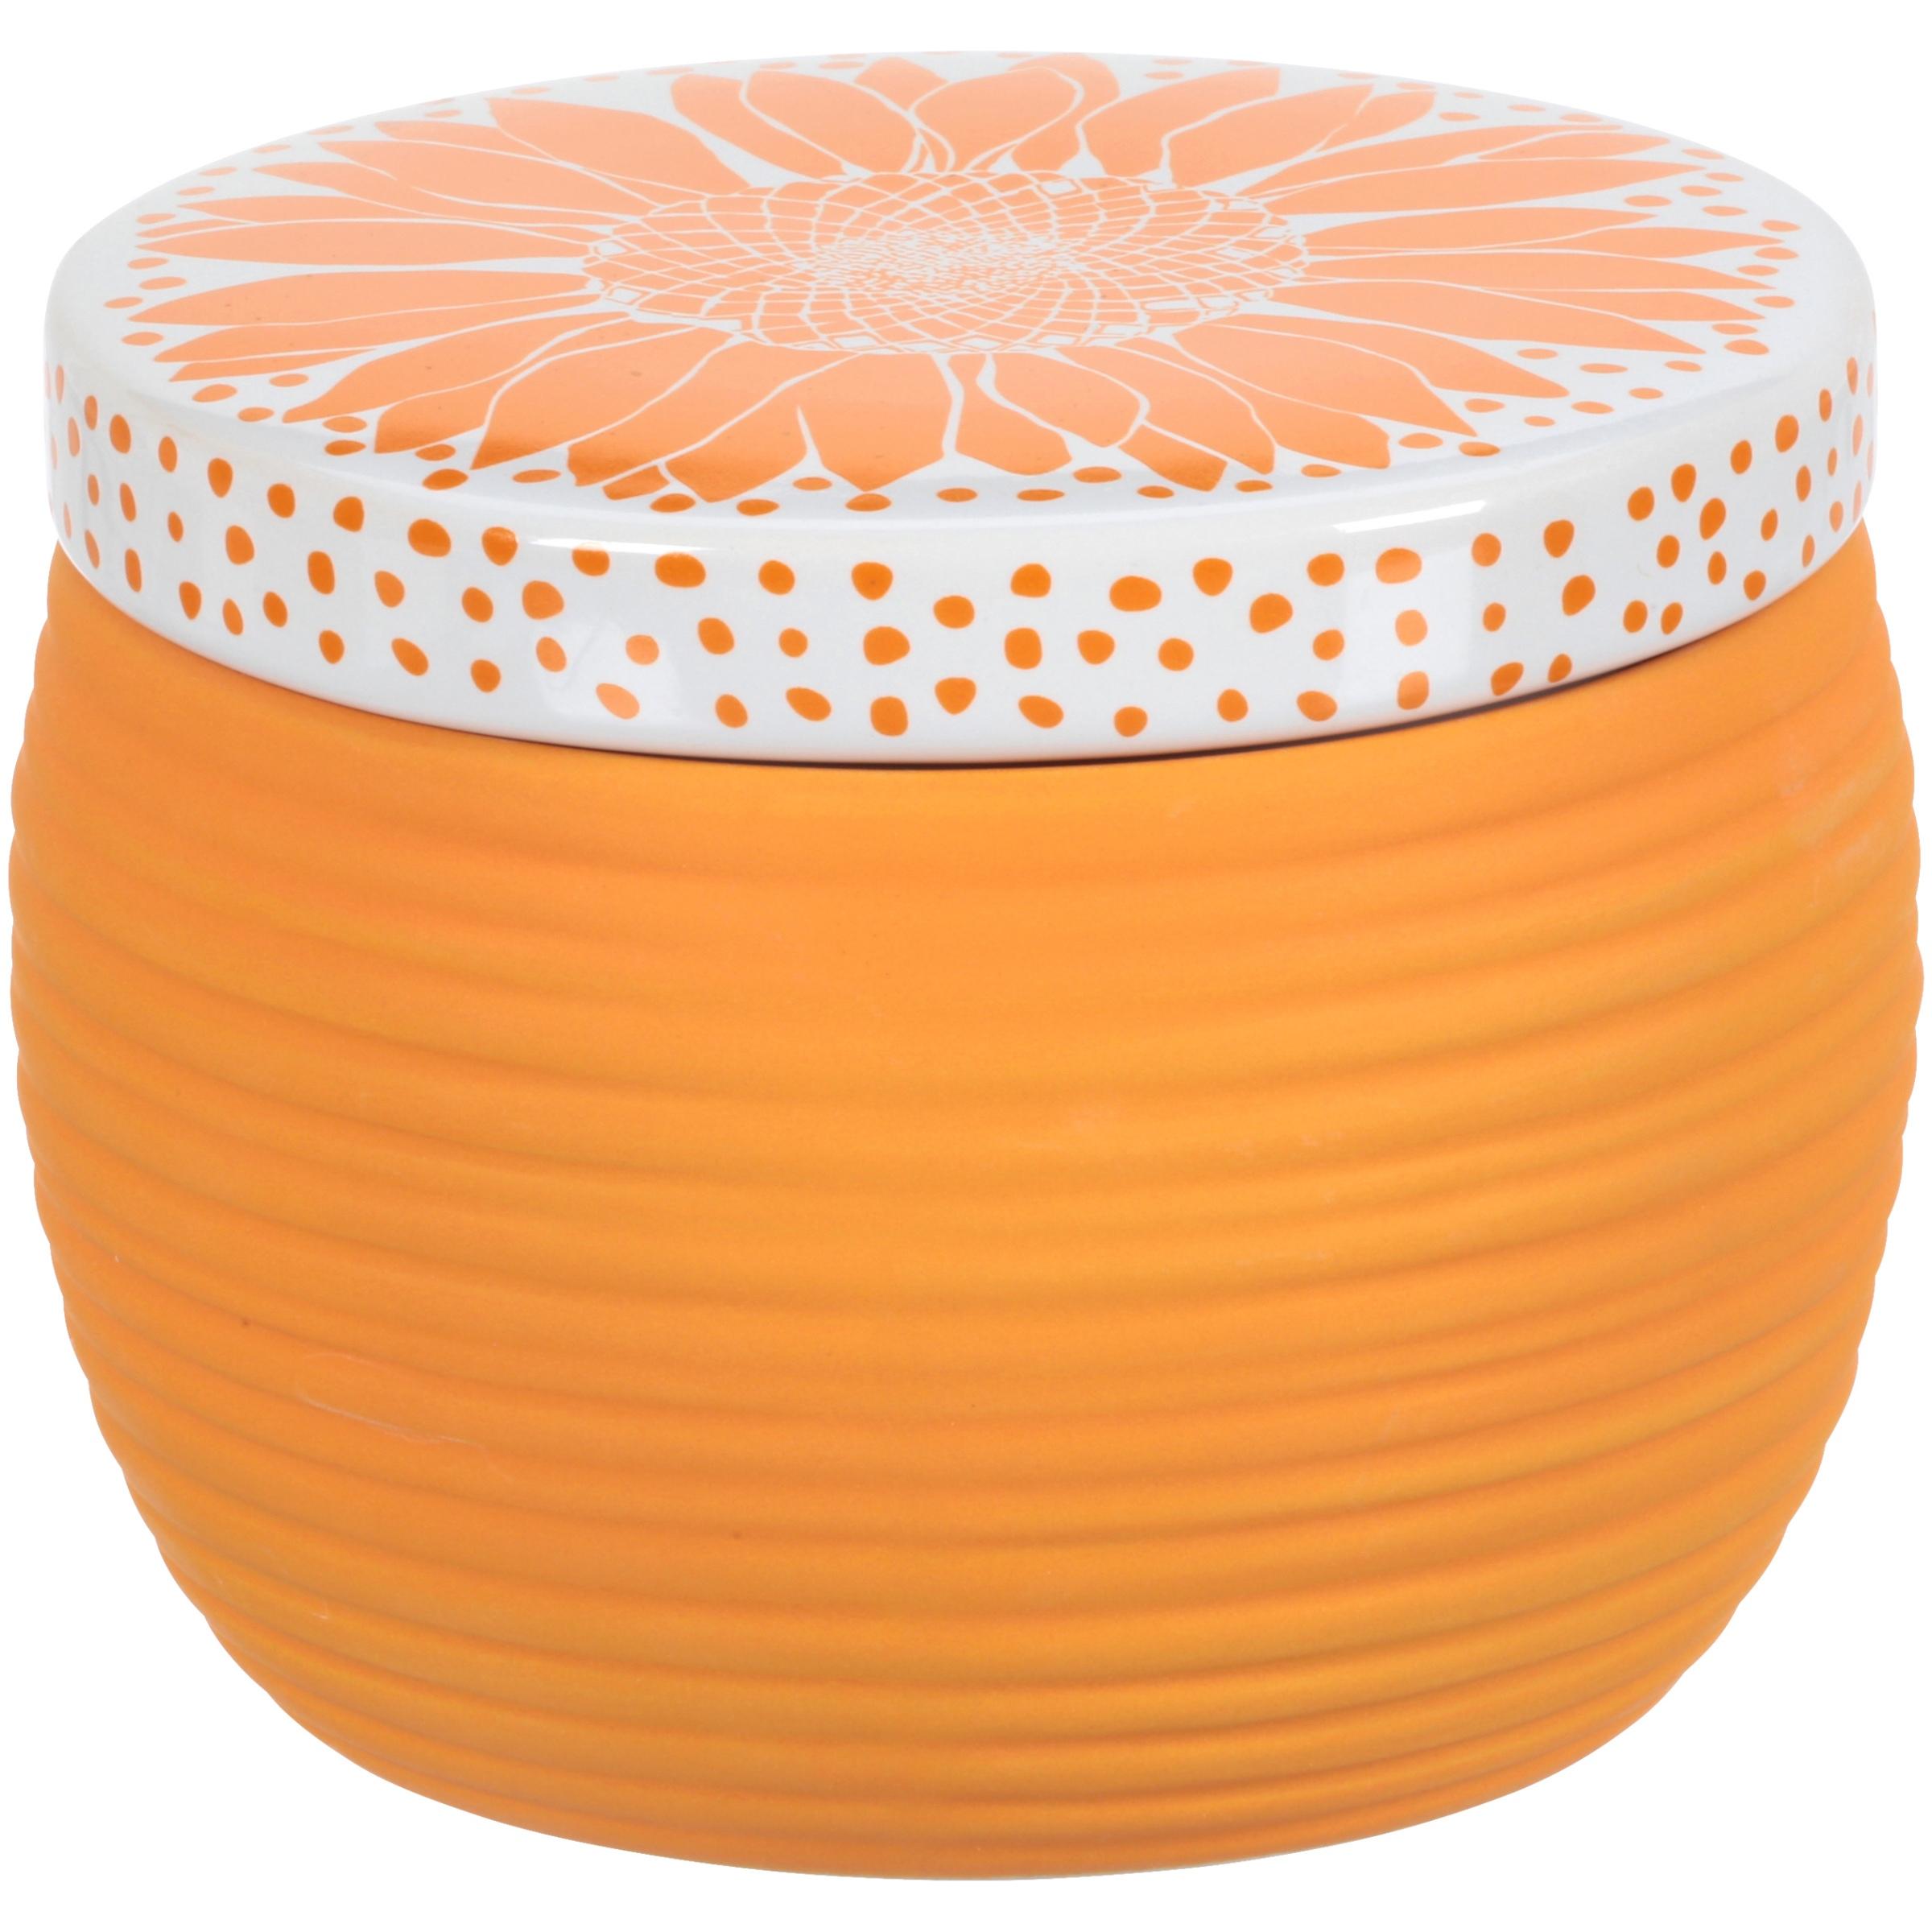 Allure Ceramic Sunflower Cotton Ball Jar